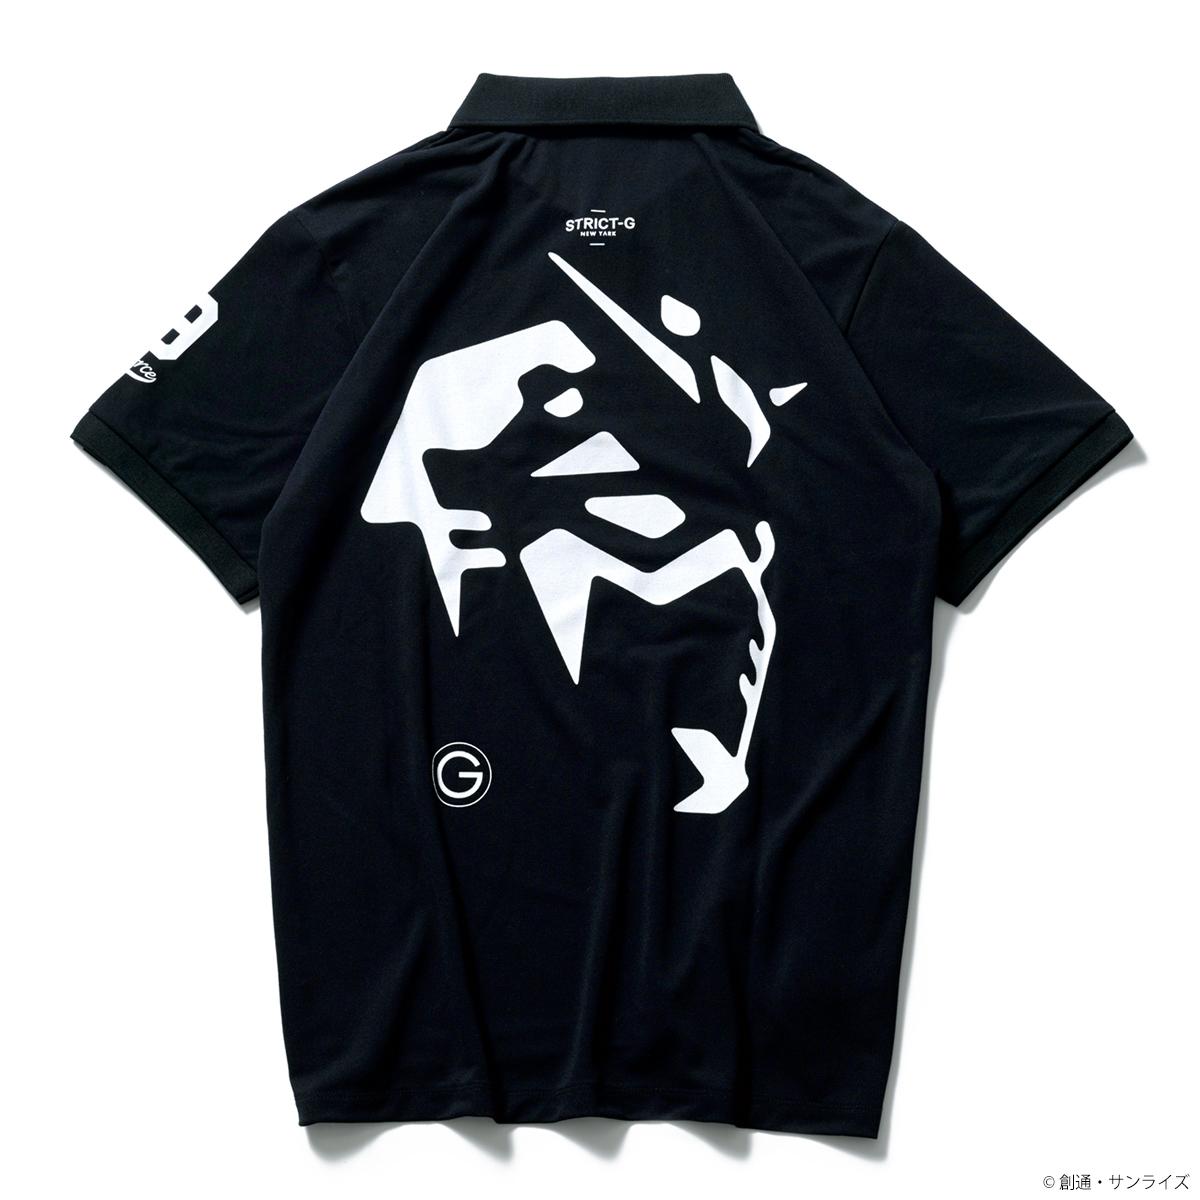 STRICT-G NEW YARK ドライポロシャツ E.F.S.FORCE